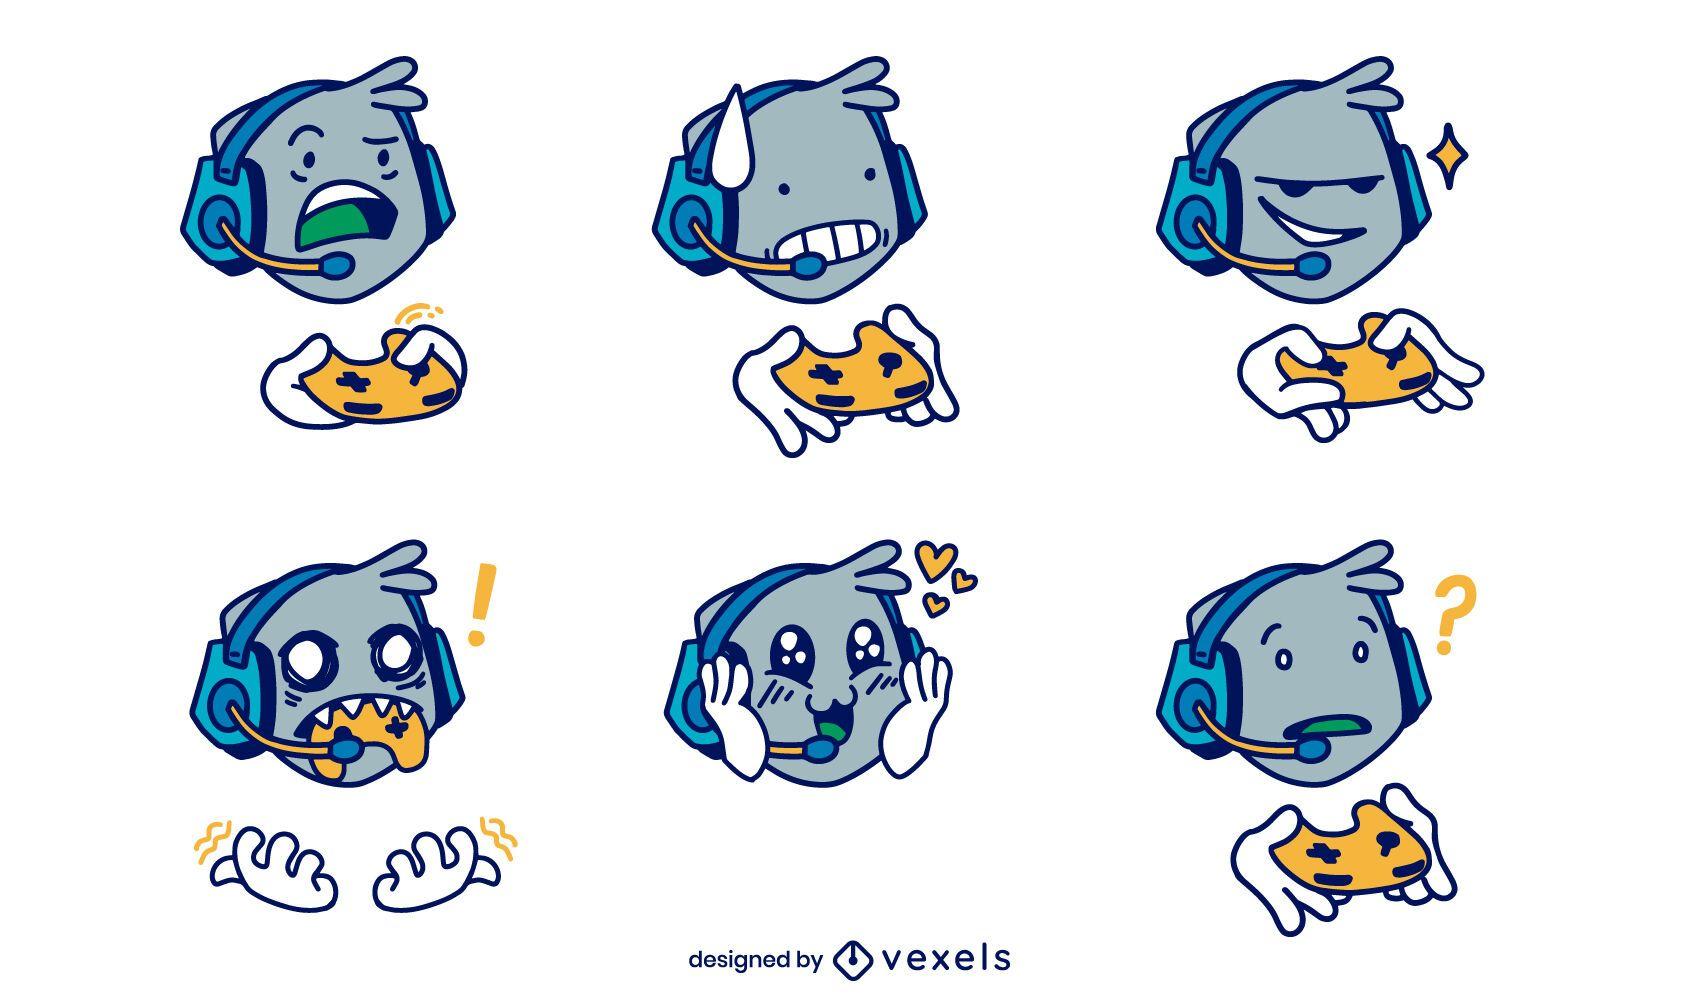 Gamer reactions character set